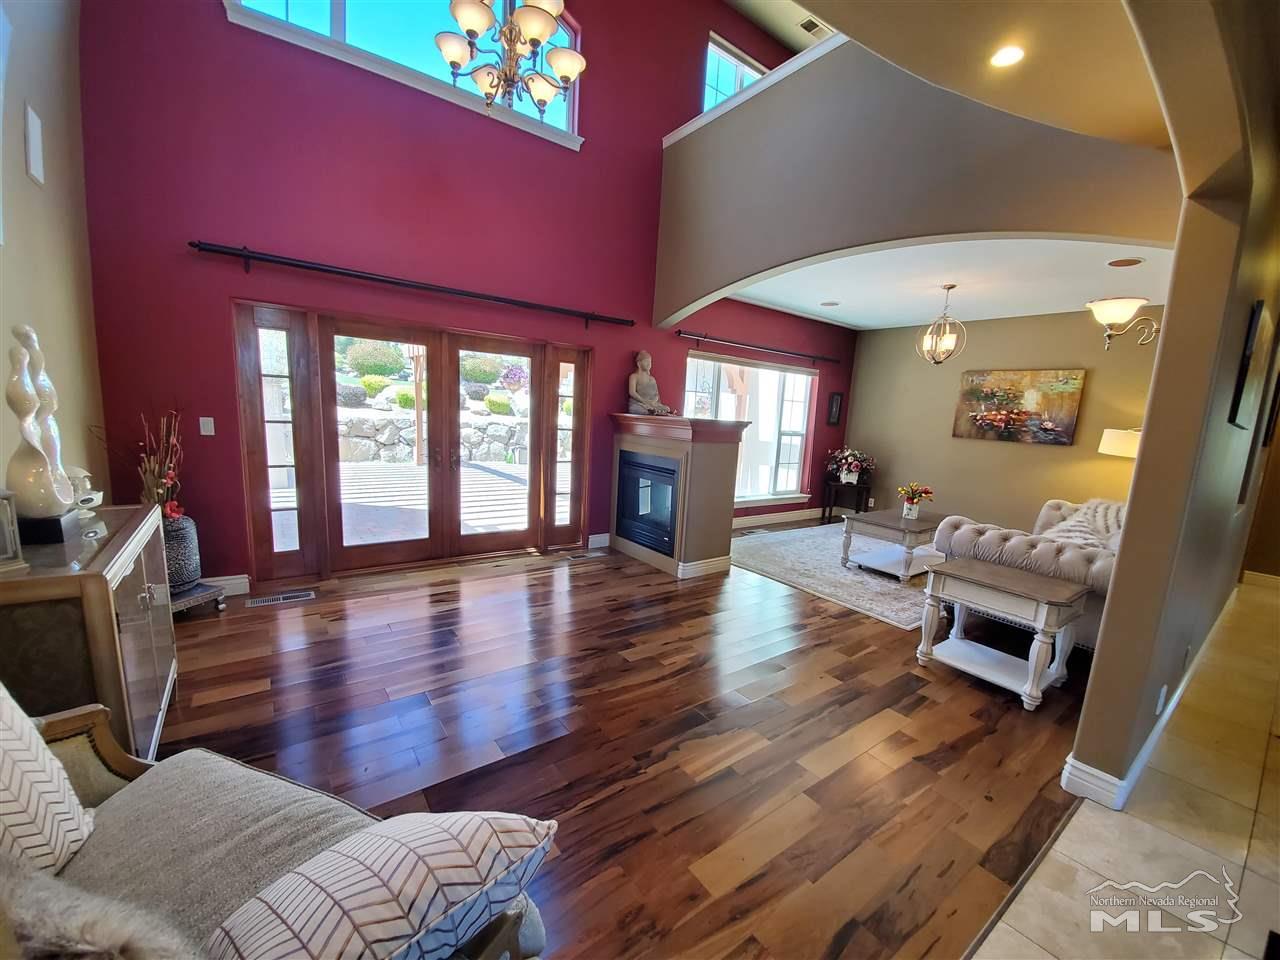 Image for 14307 Swift Creek Court, Reno, NV 89511